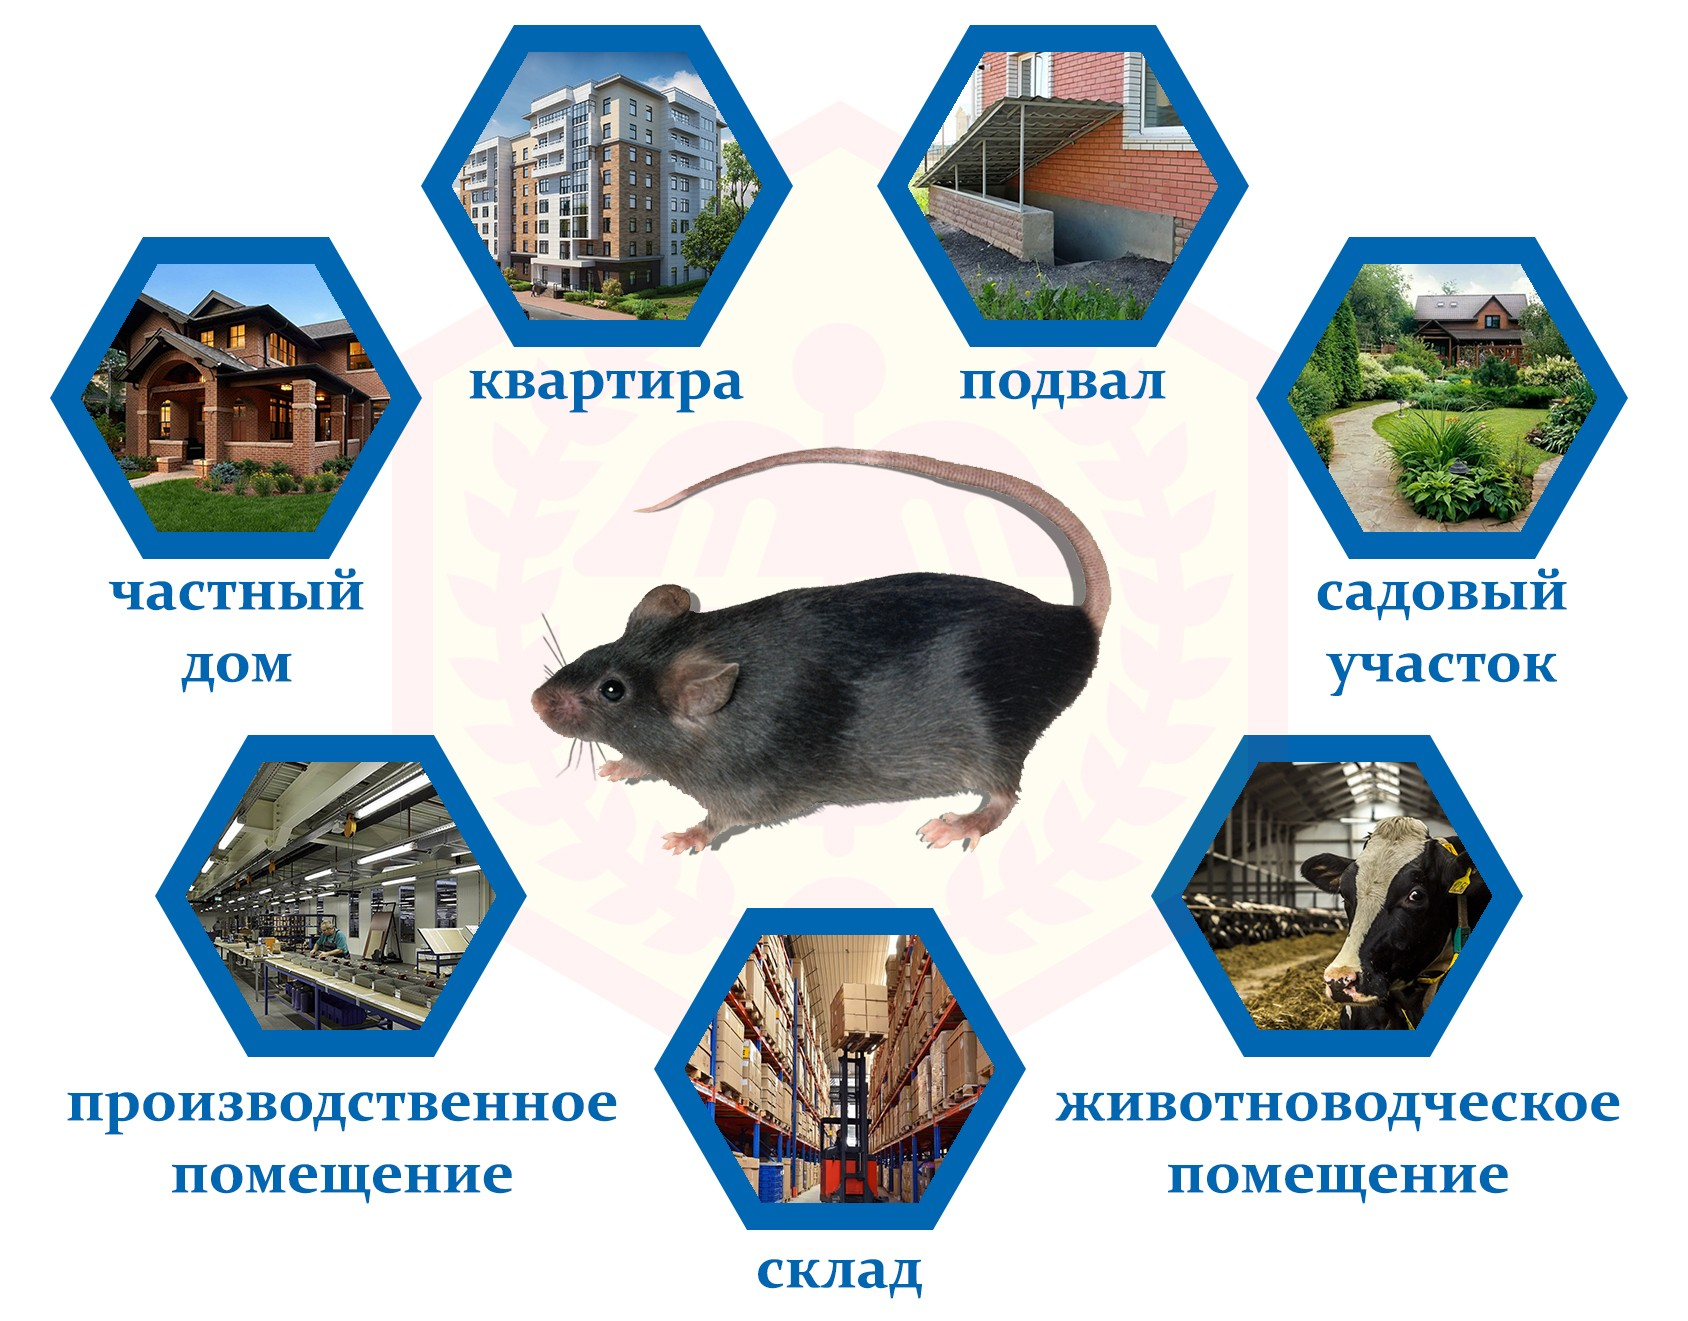 Места обитания мыши